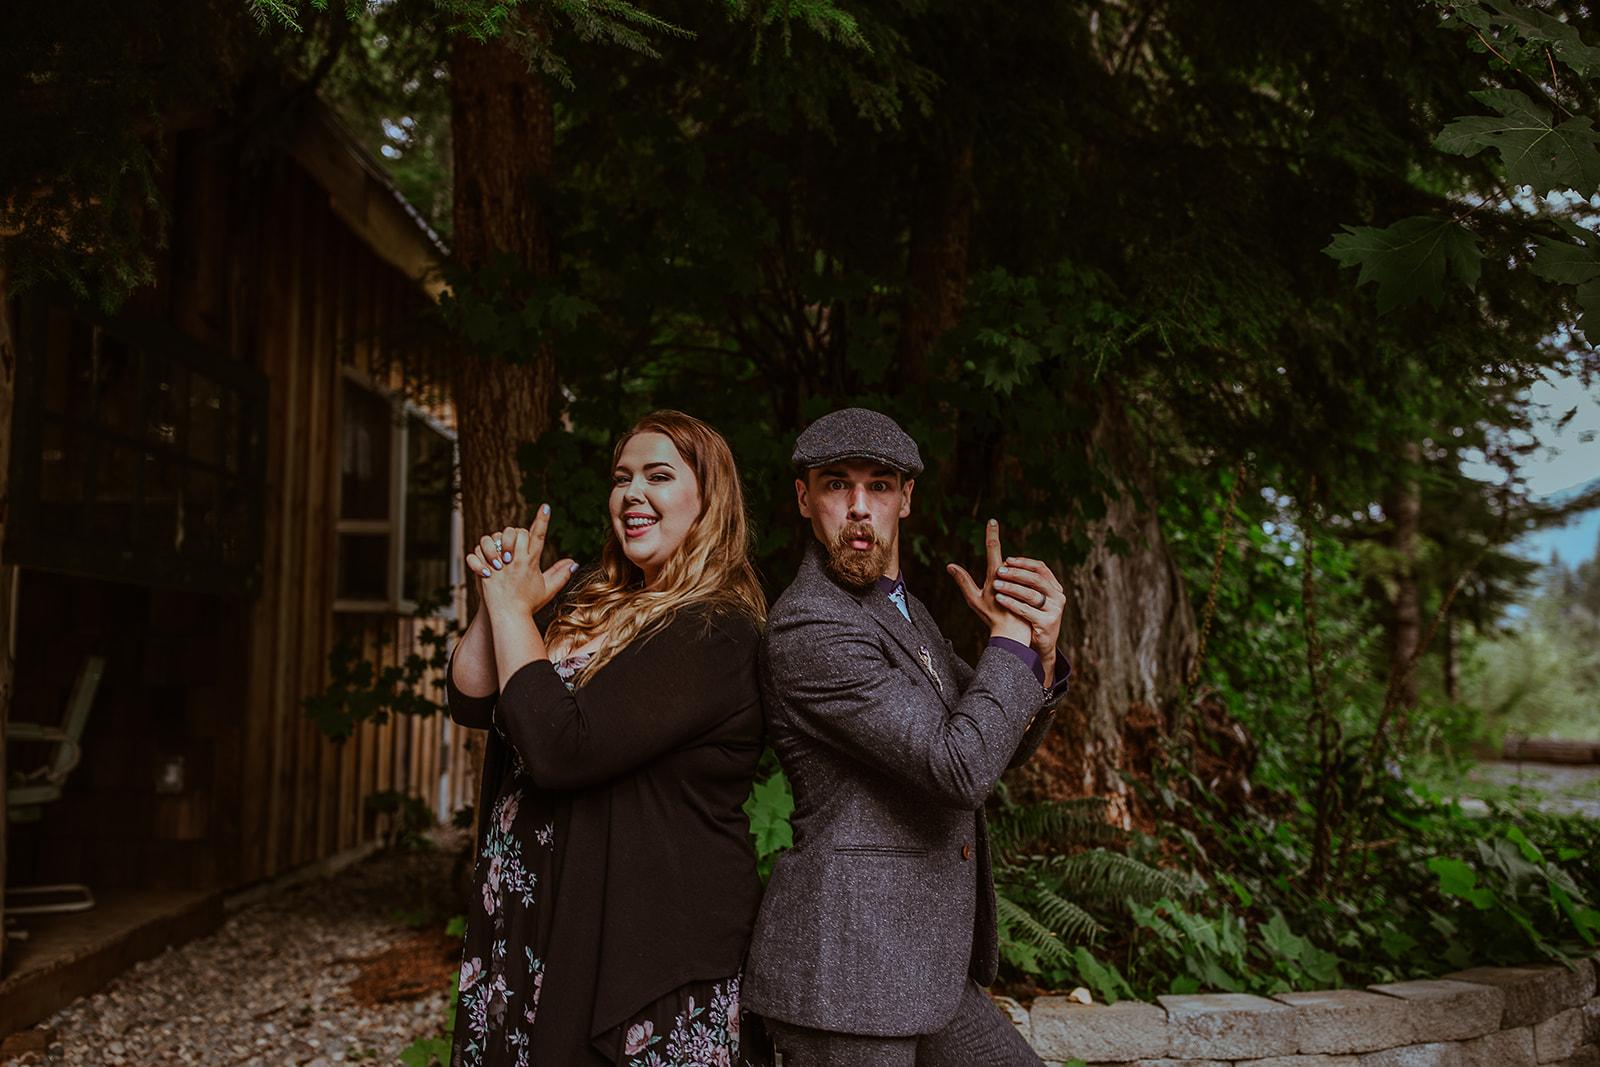 mount-rainier-cabin-elopement-megan-gallagher-photography_(307_of_568).jpg